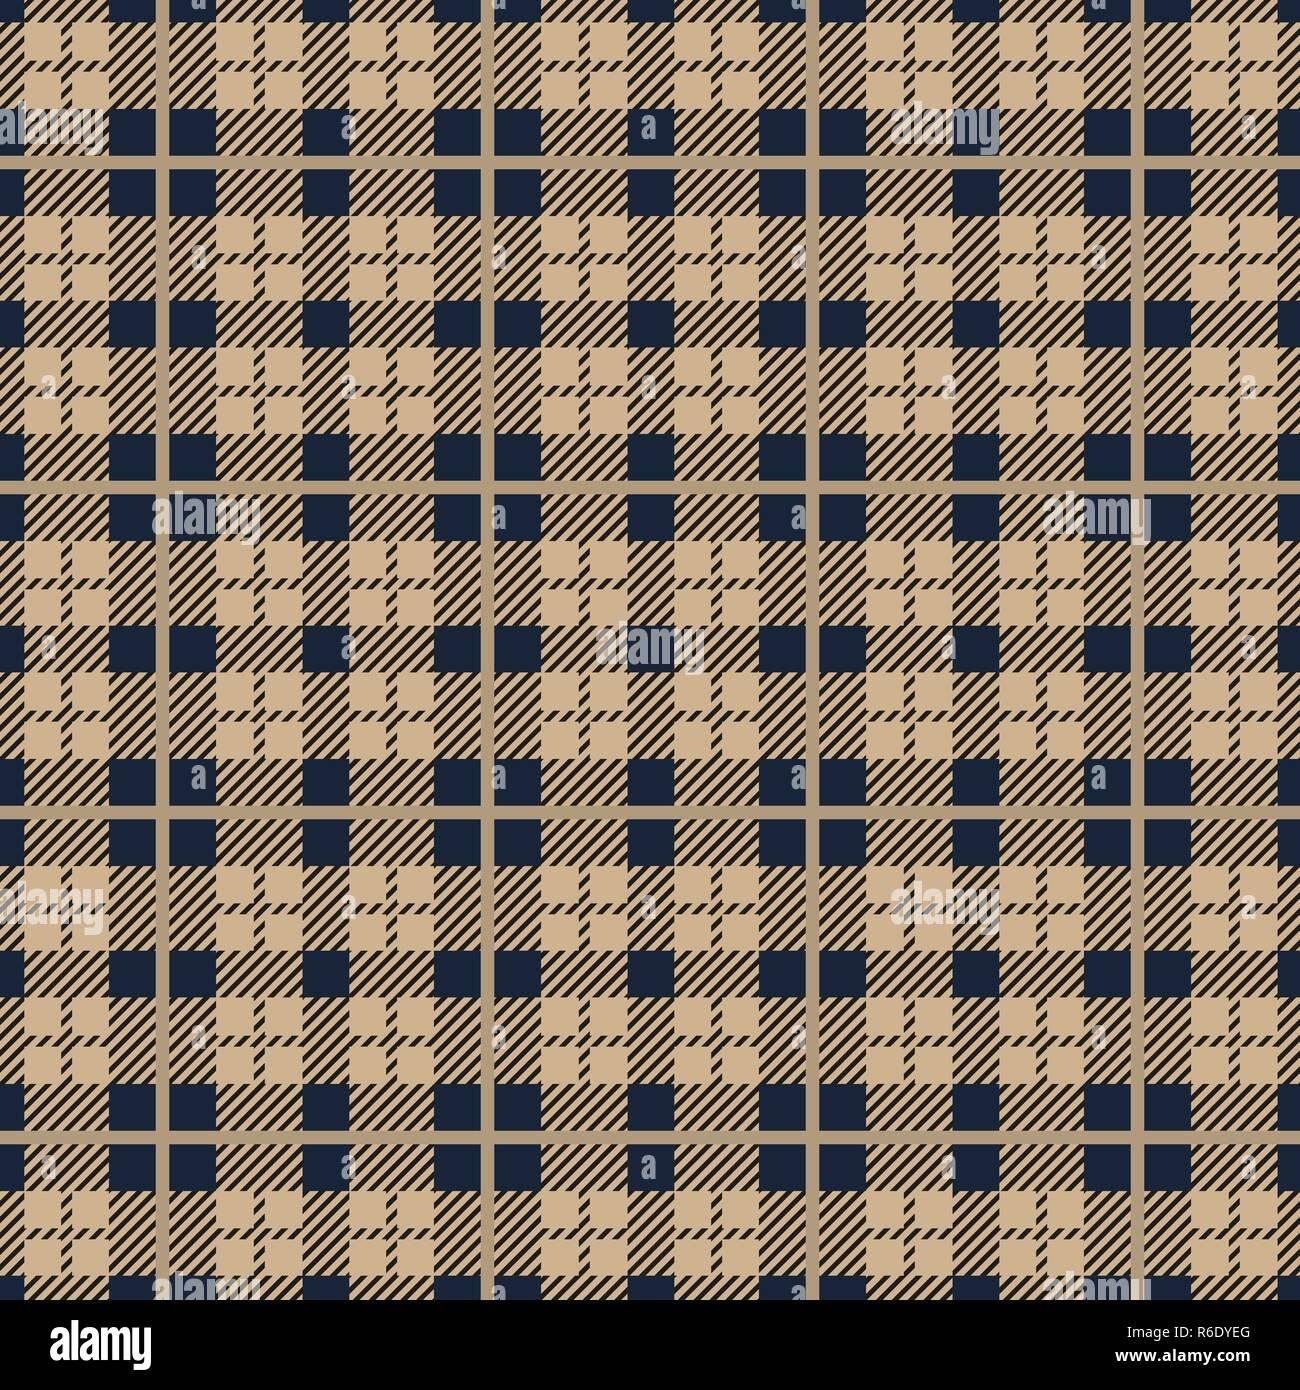 In Tartan Pattern Seamless Sfondo Rosso Nero Blu Beige Verde E